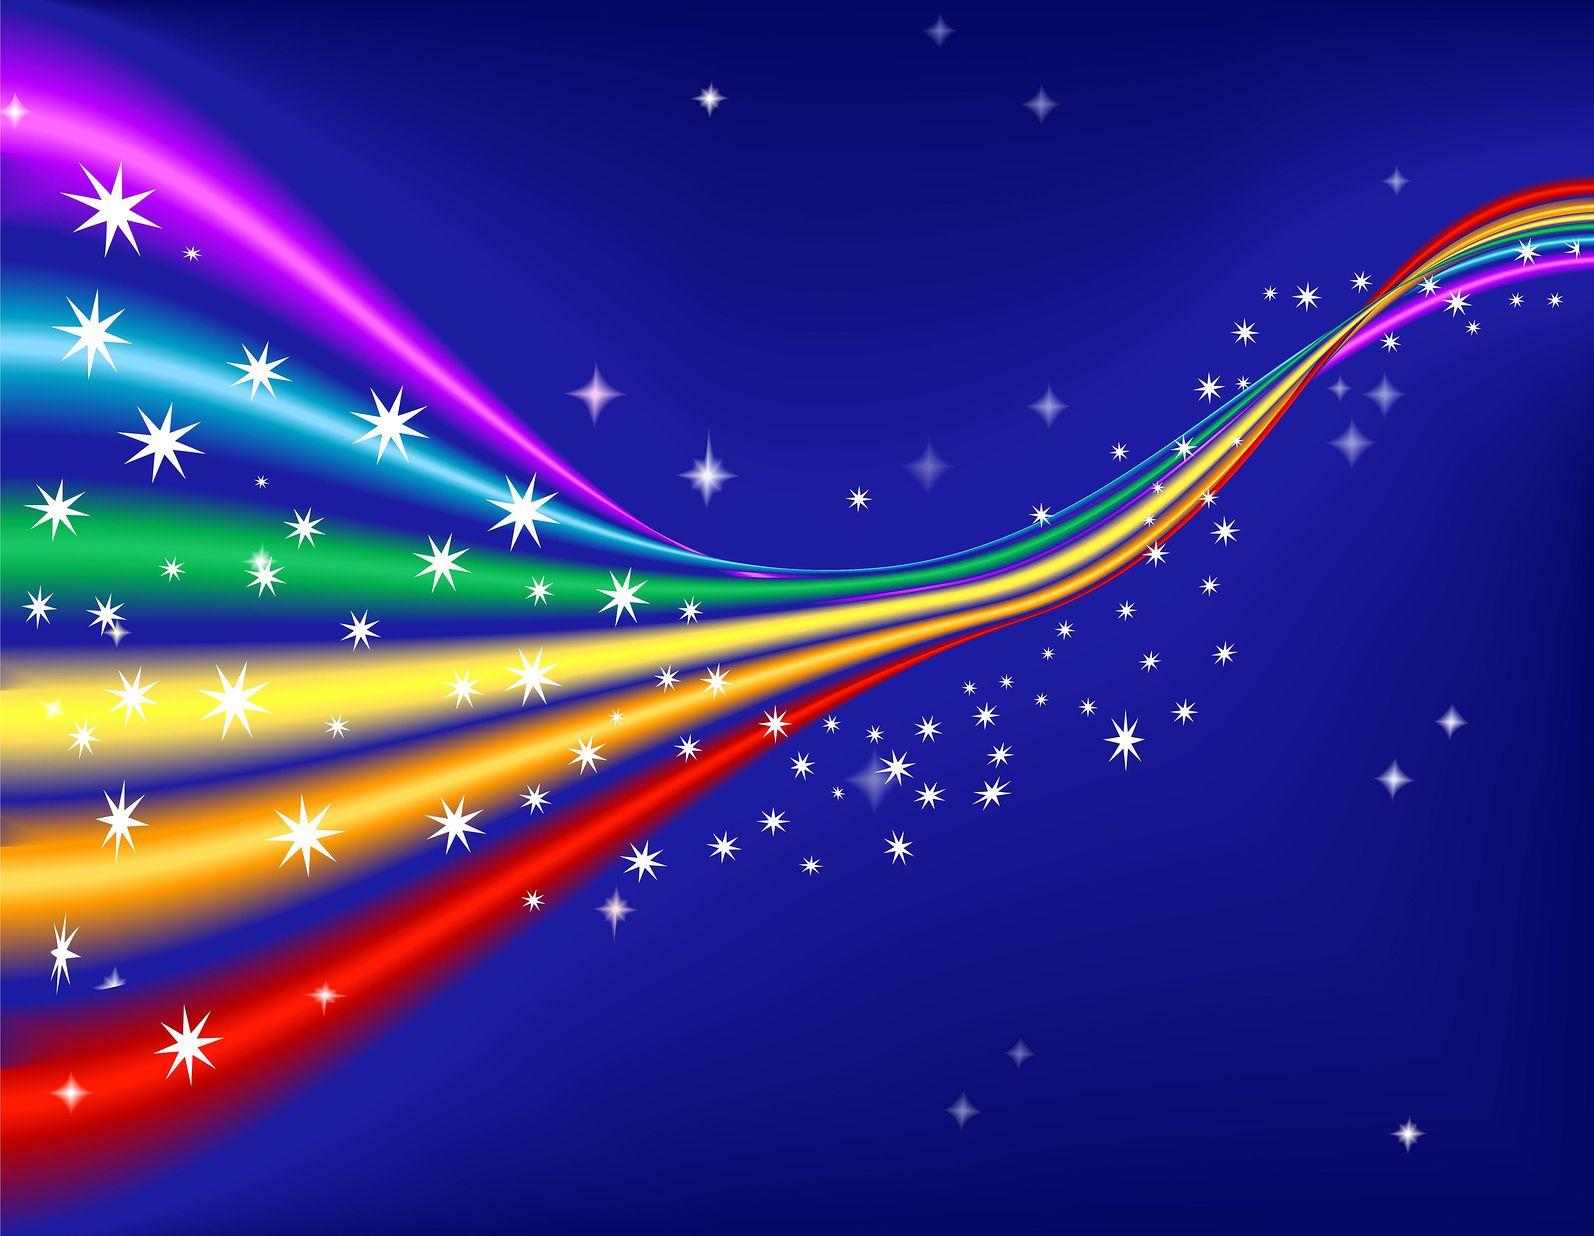 Pin by Naomi Orogun on INCREDIBLE RAINBOWS Rainbow